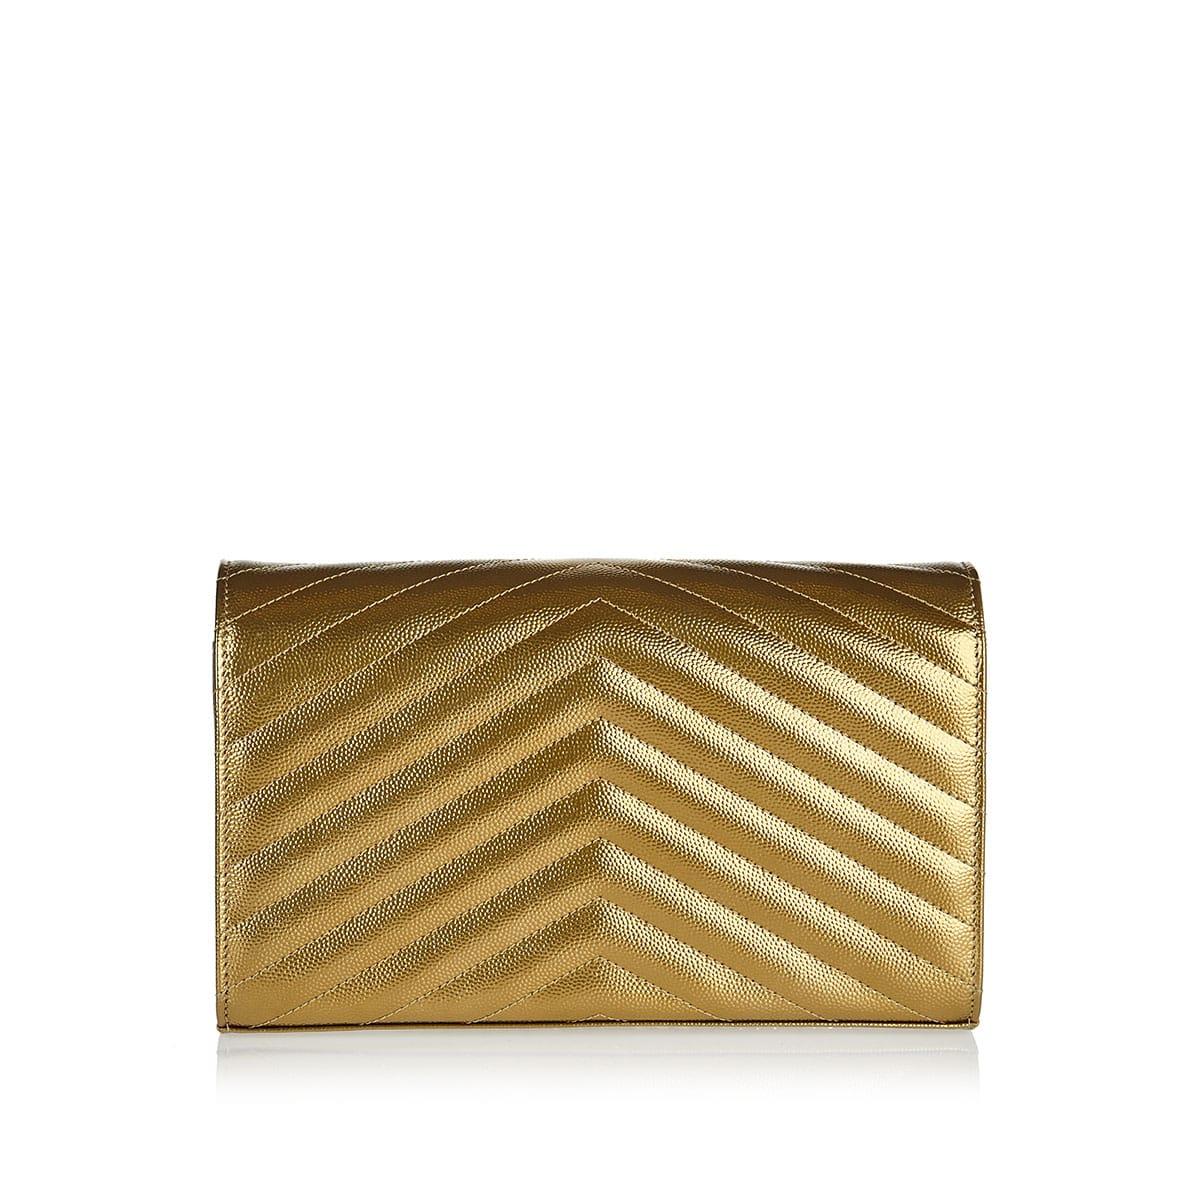 Monogram metallic leather chain wallet